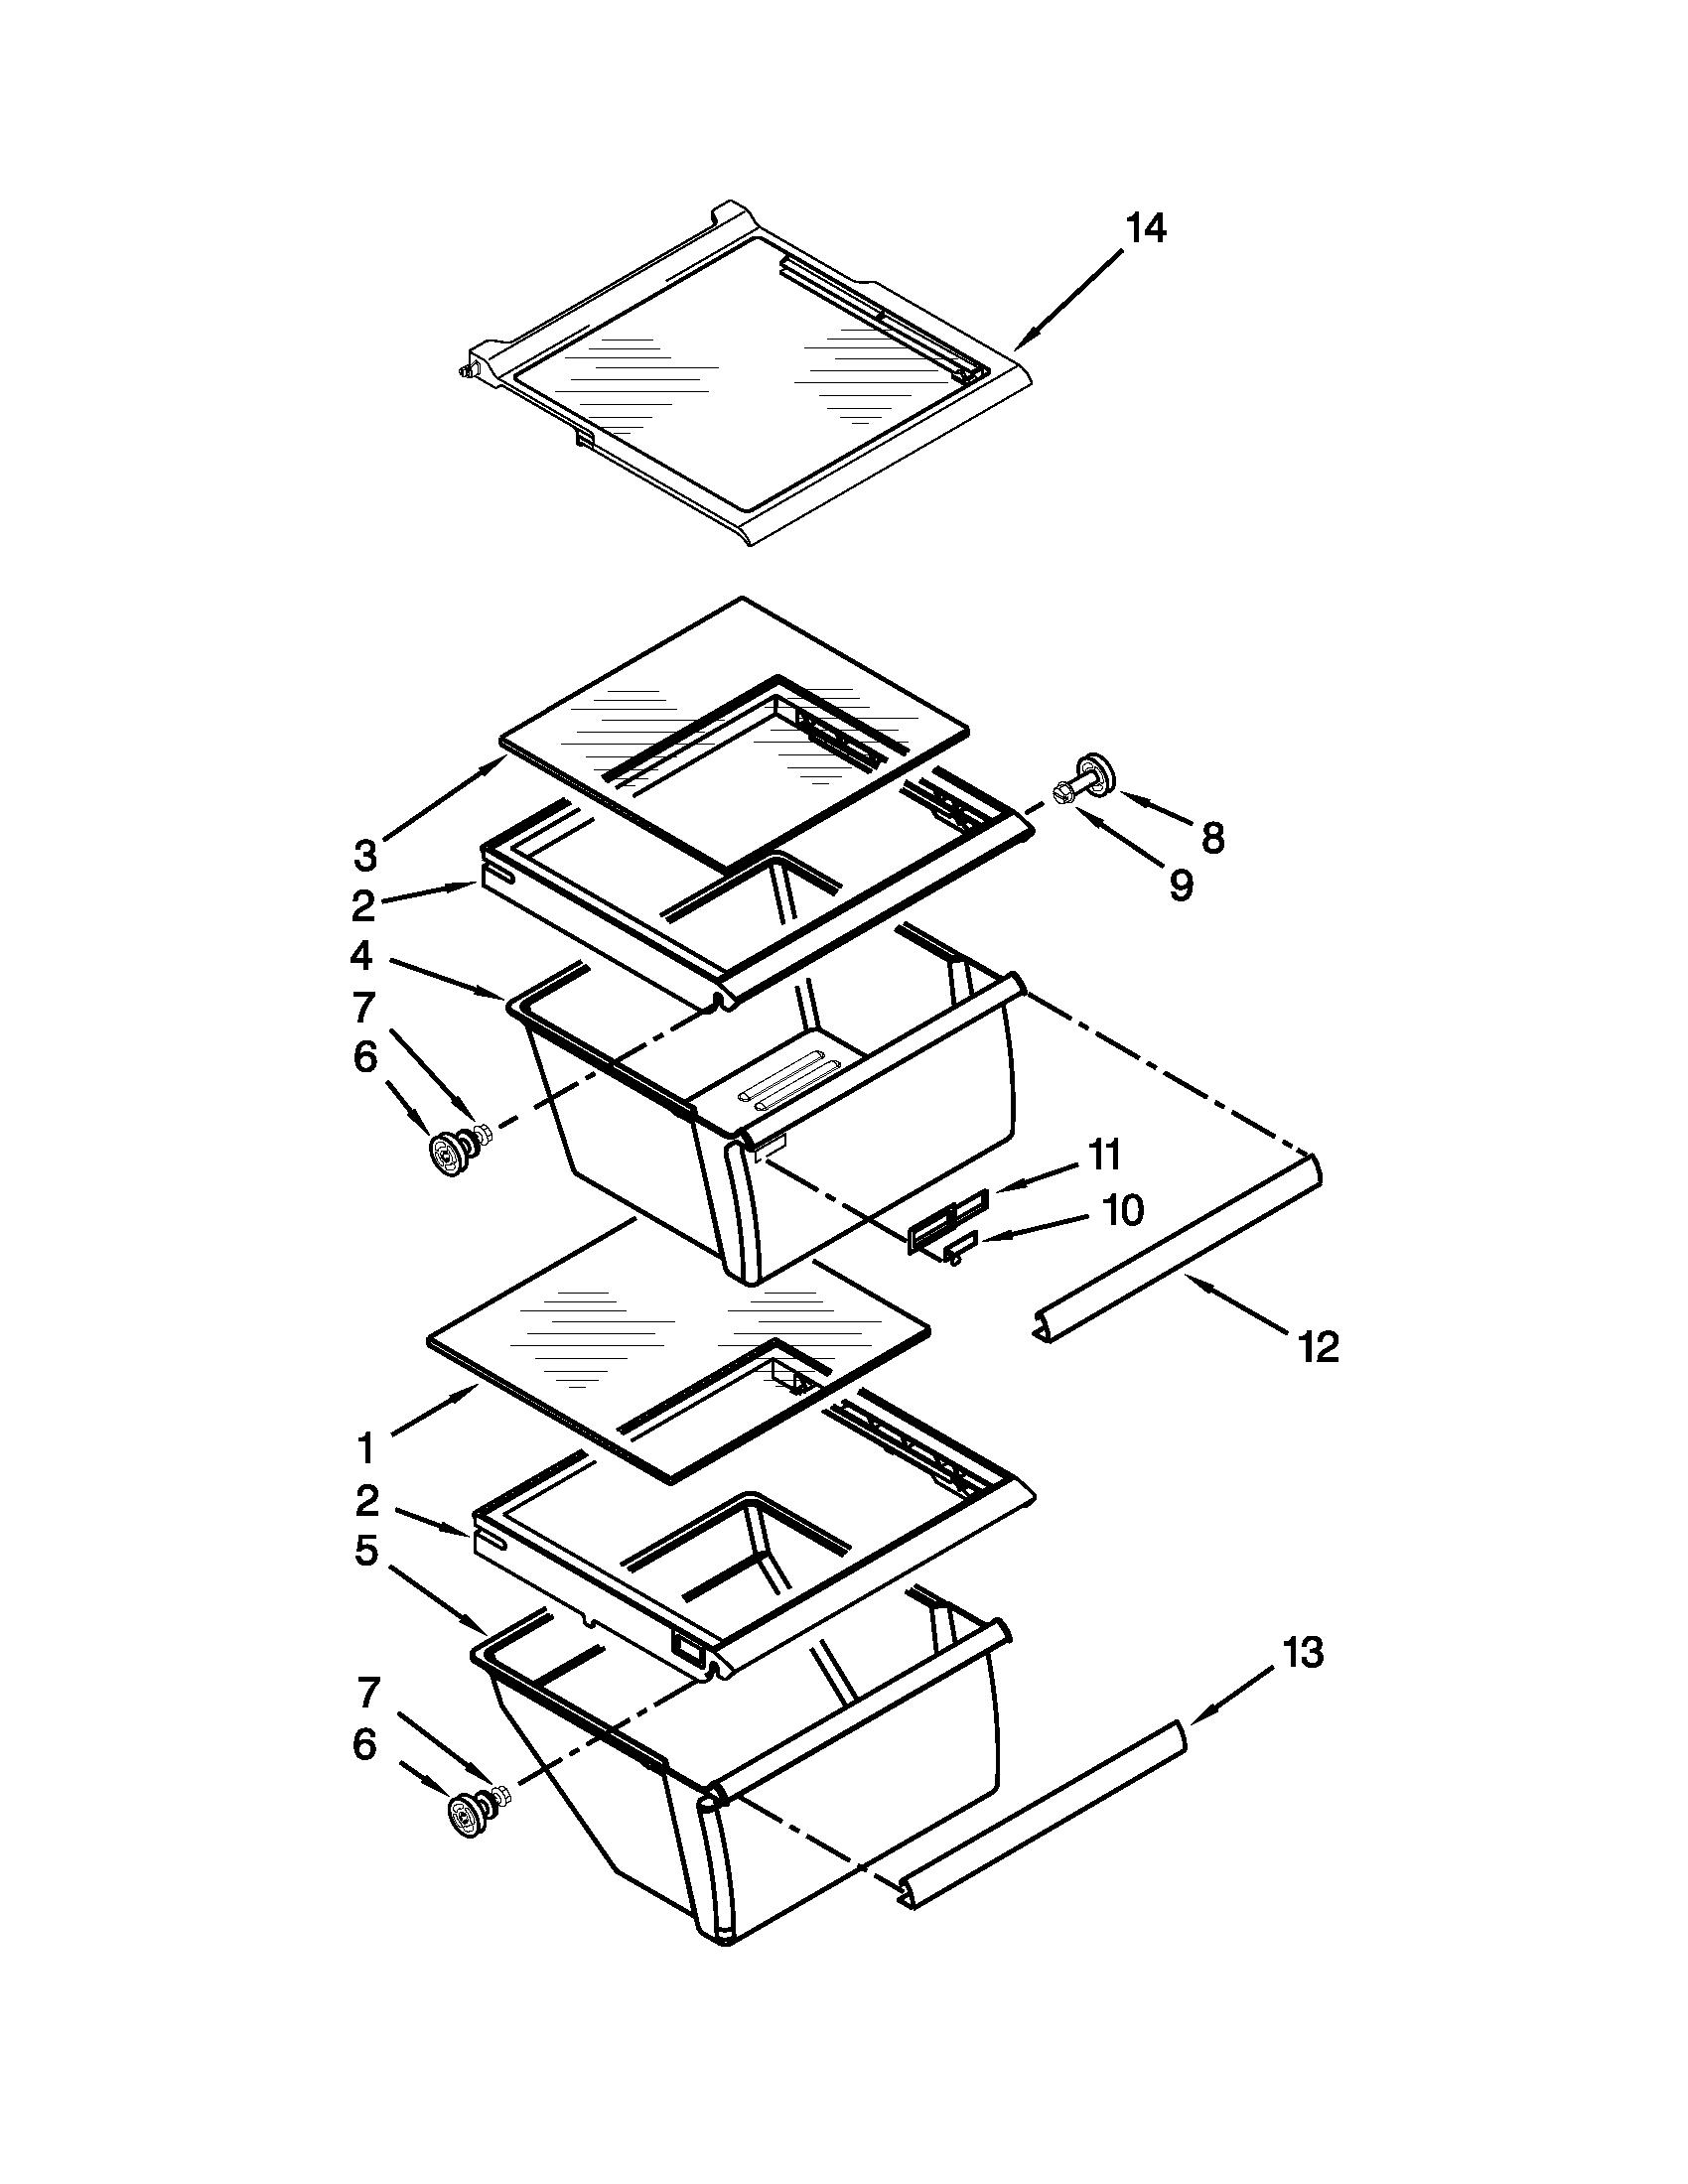 Kenmore model 10650023211 side-by-side refrigerator